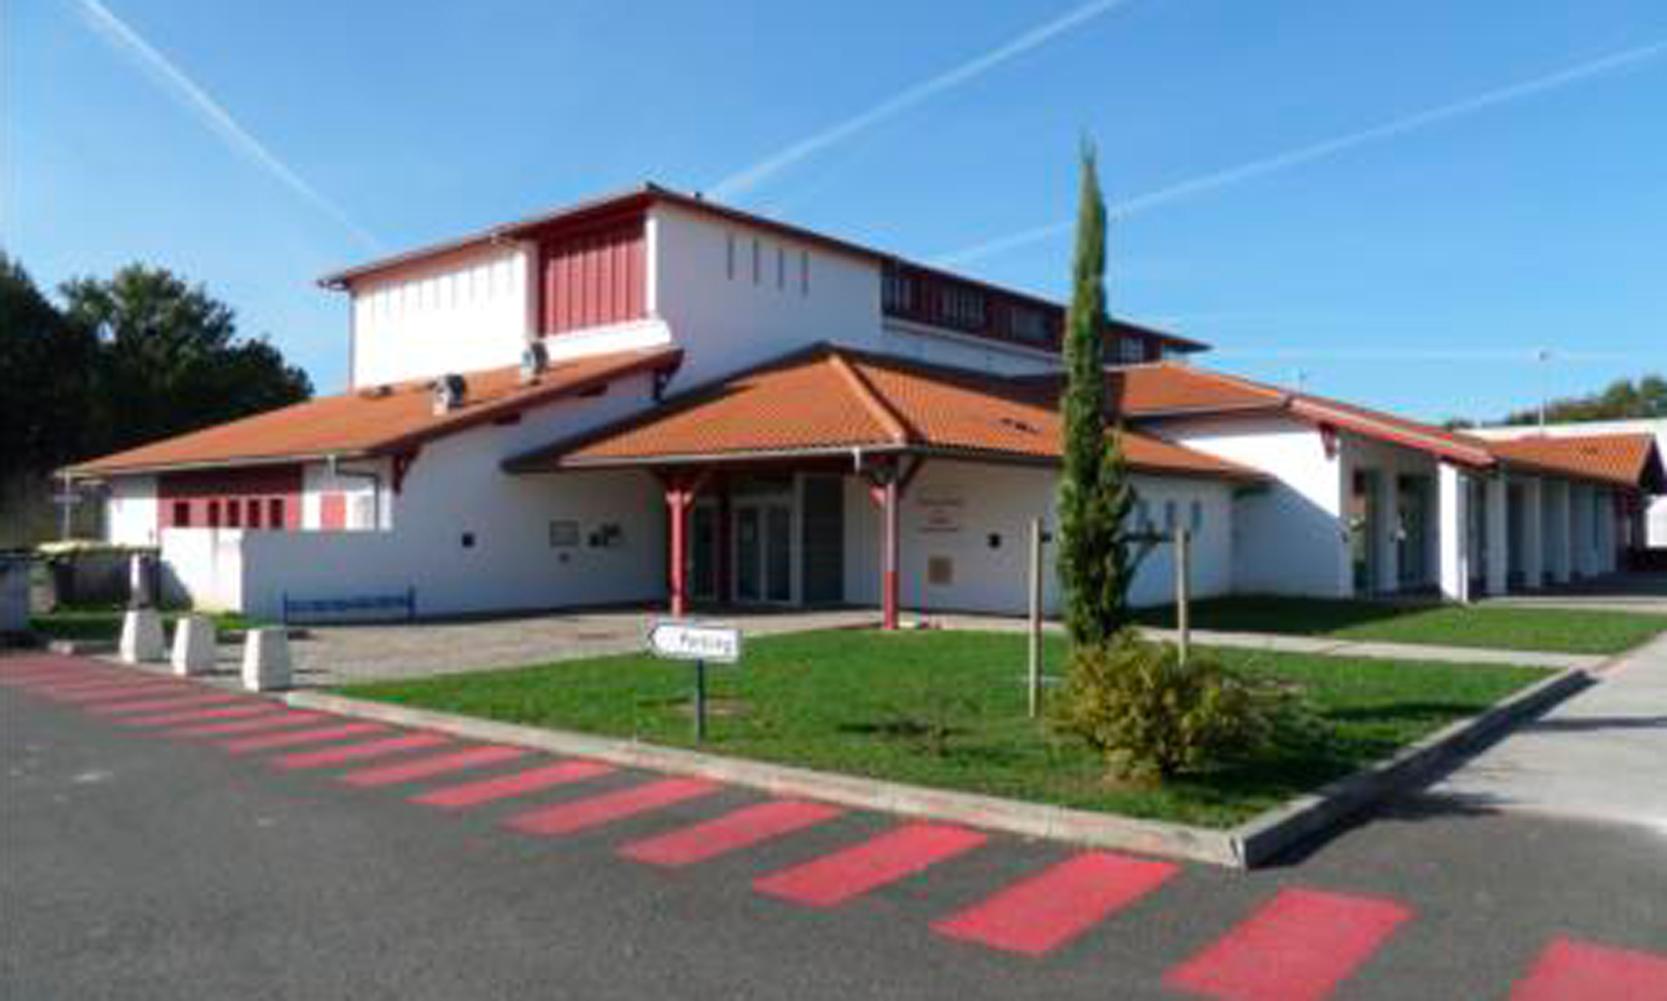 Salle Jean castaing